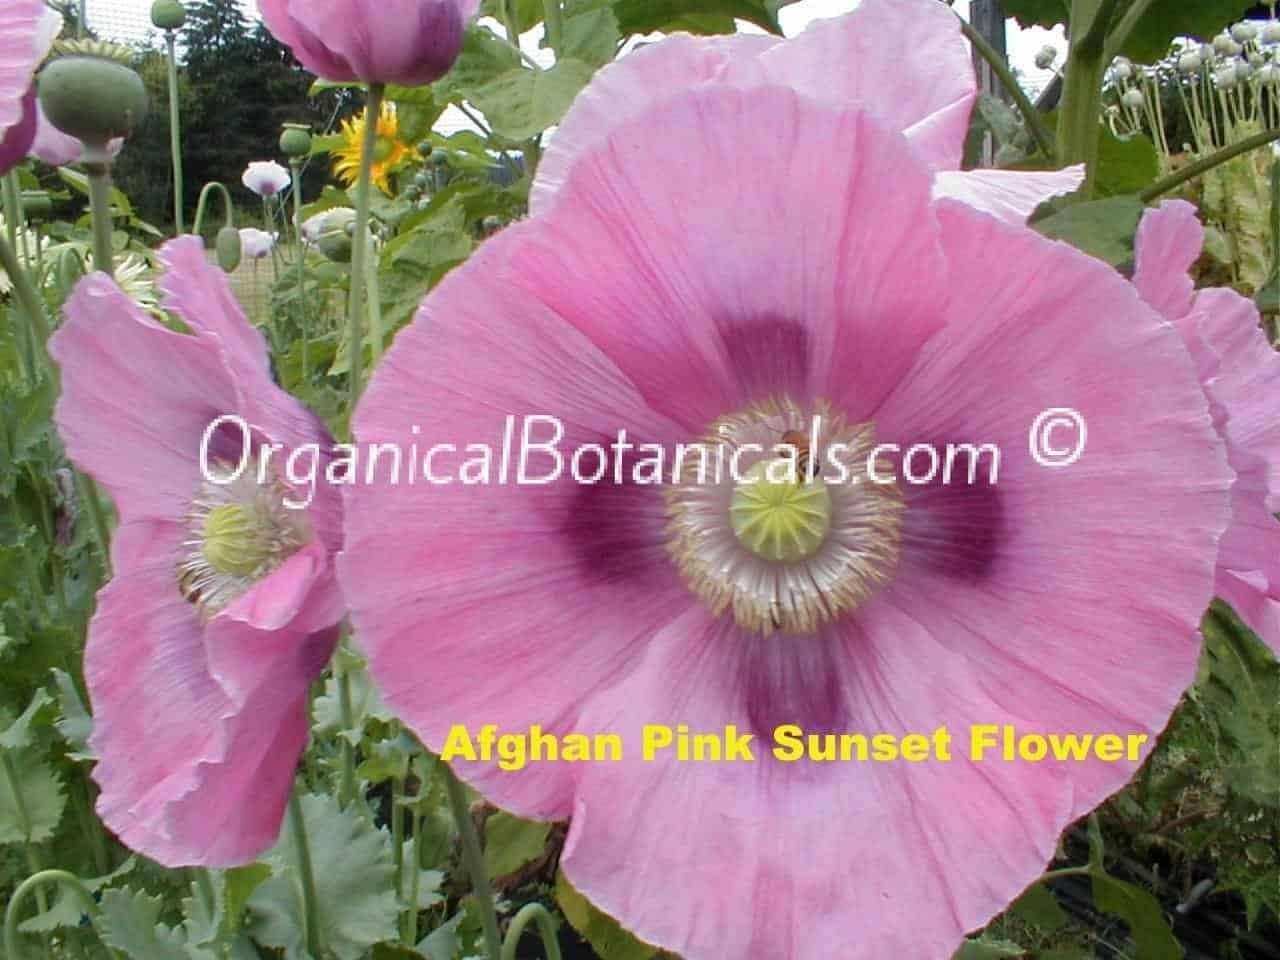 'Afghan Pink Sunset' Papaver Somniferum Poppy Flower